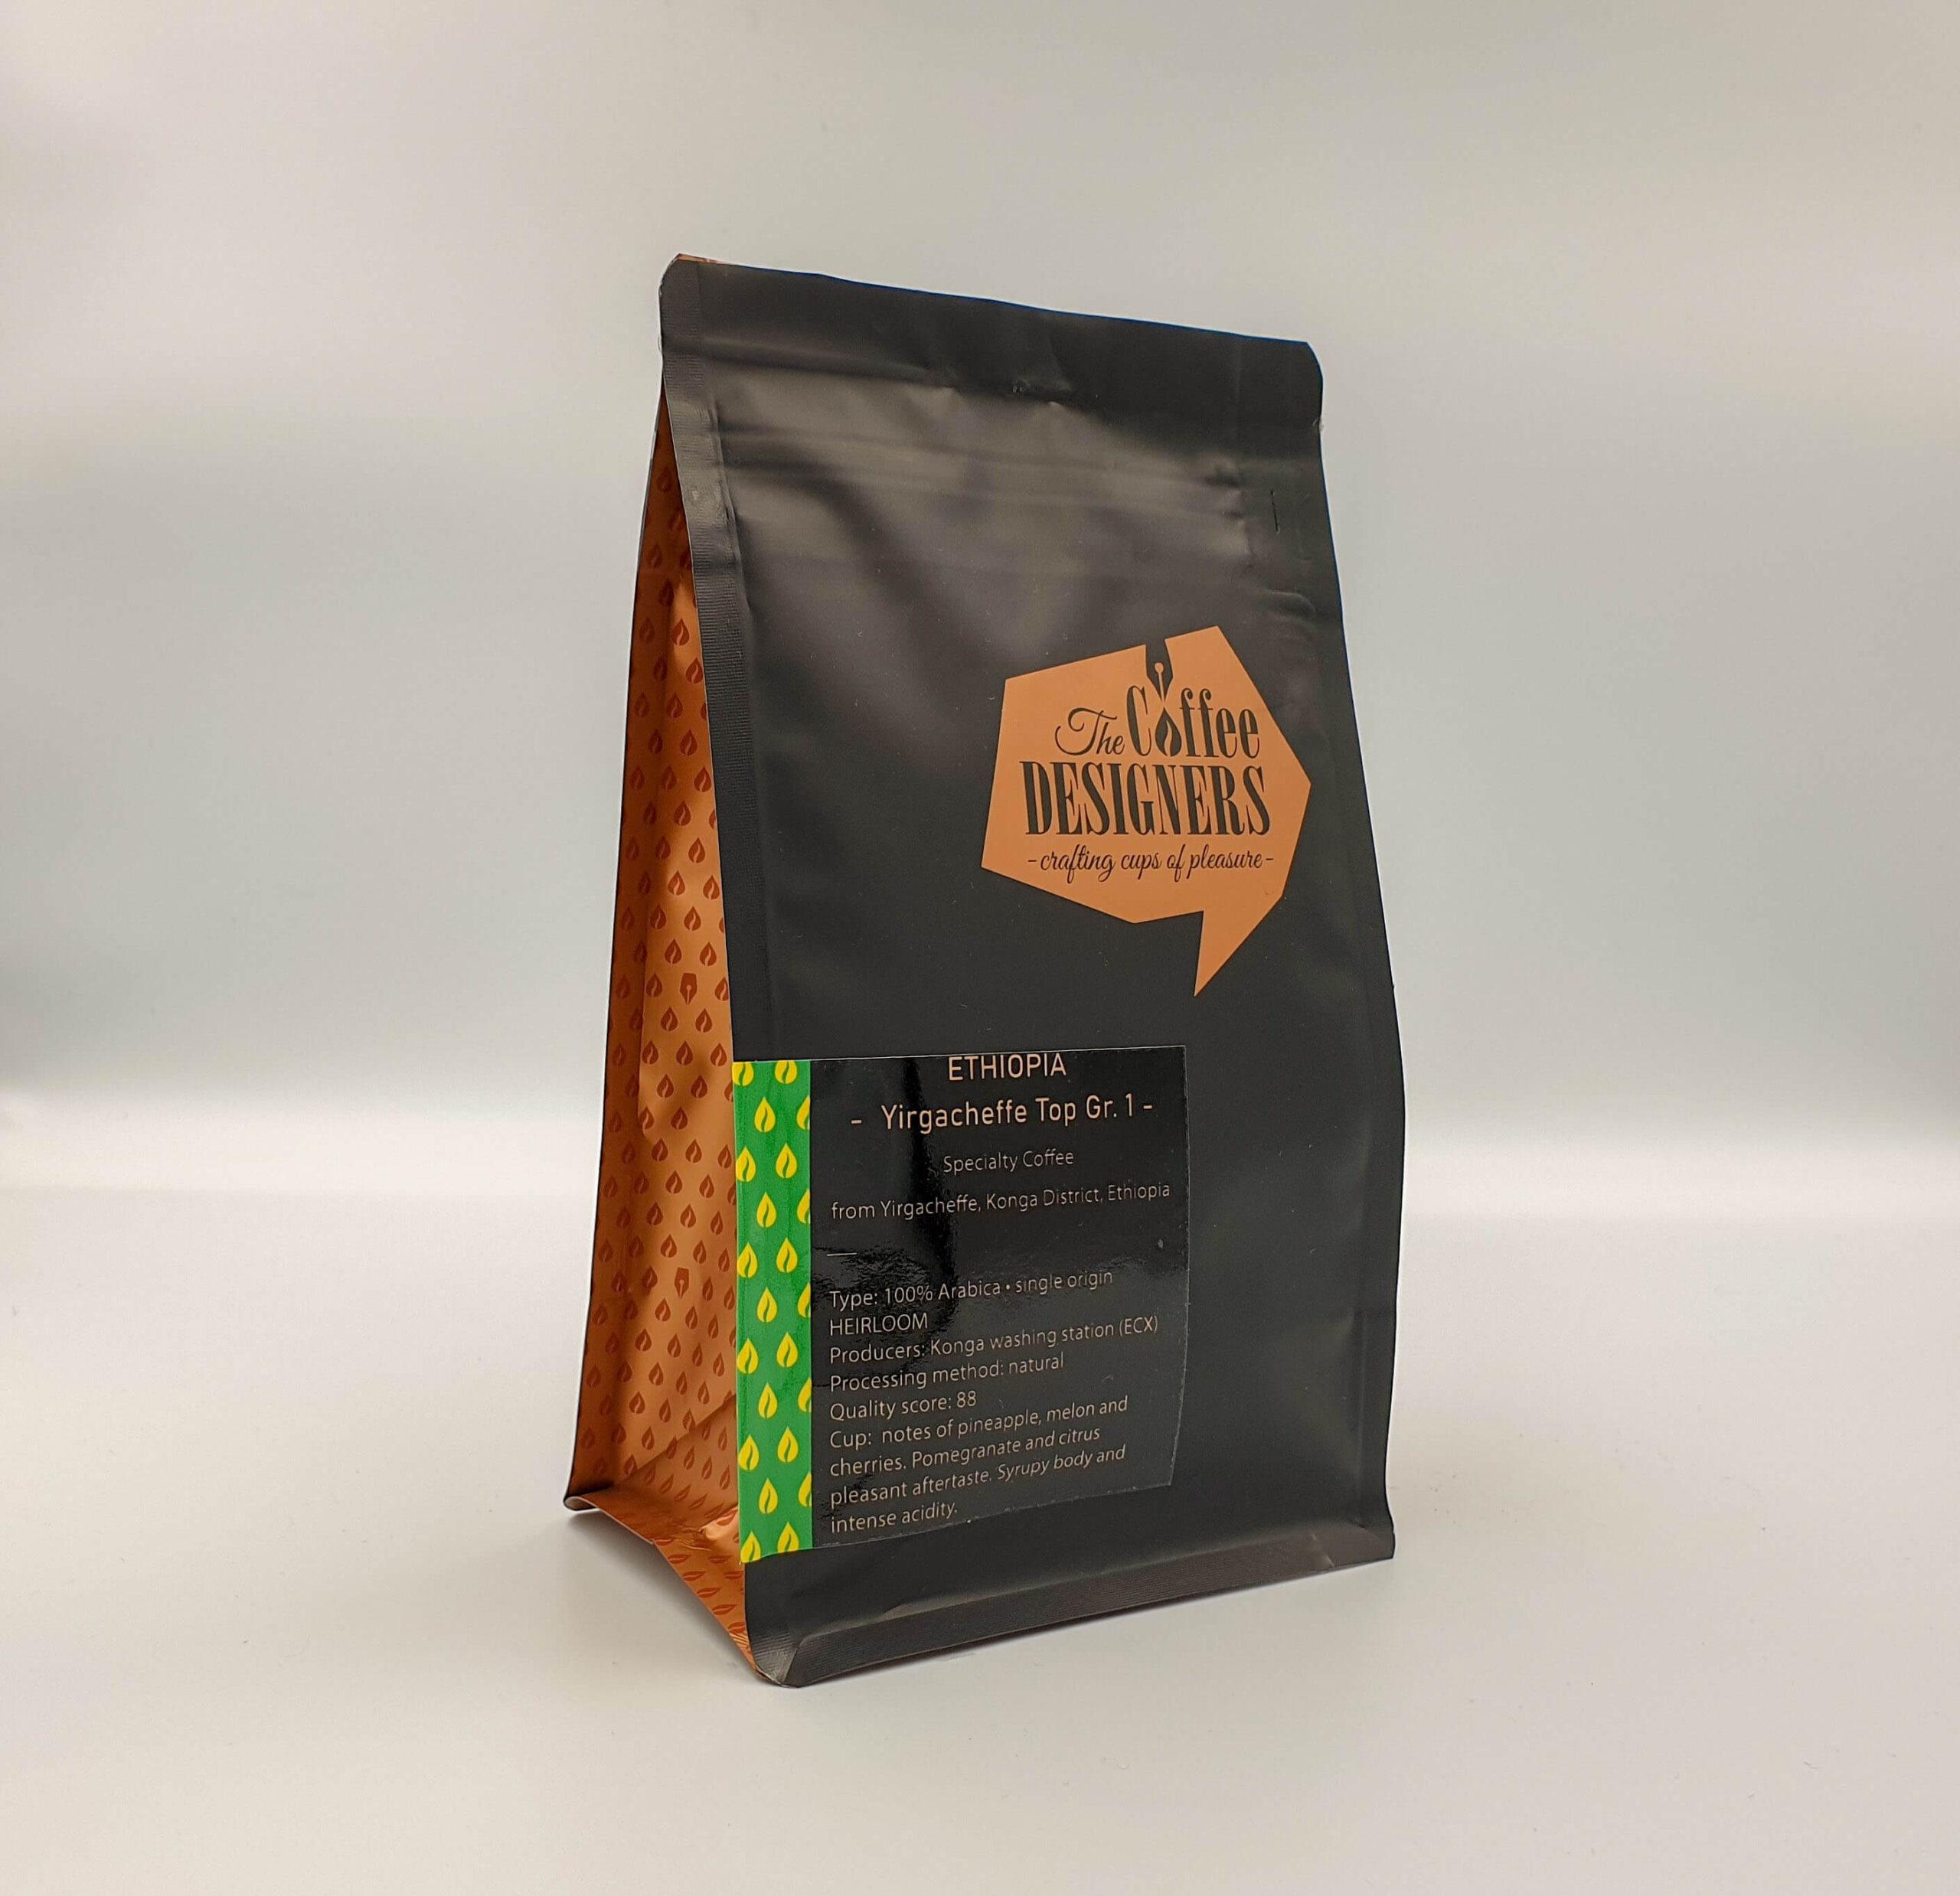 Cafea de specialitate_Ethiopia Yiragacheffe Top Gr. 1_Coffee Designers